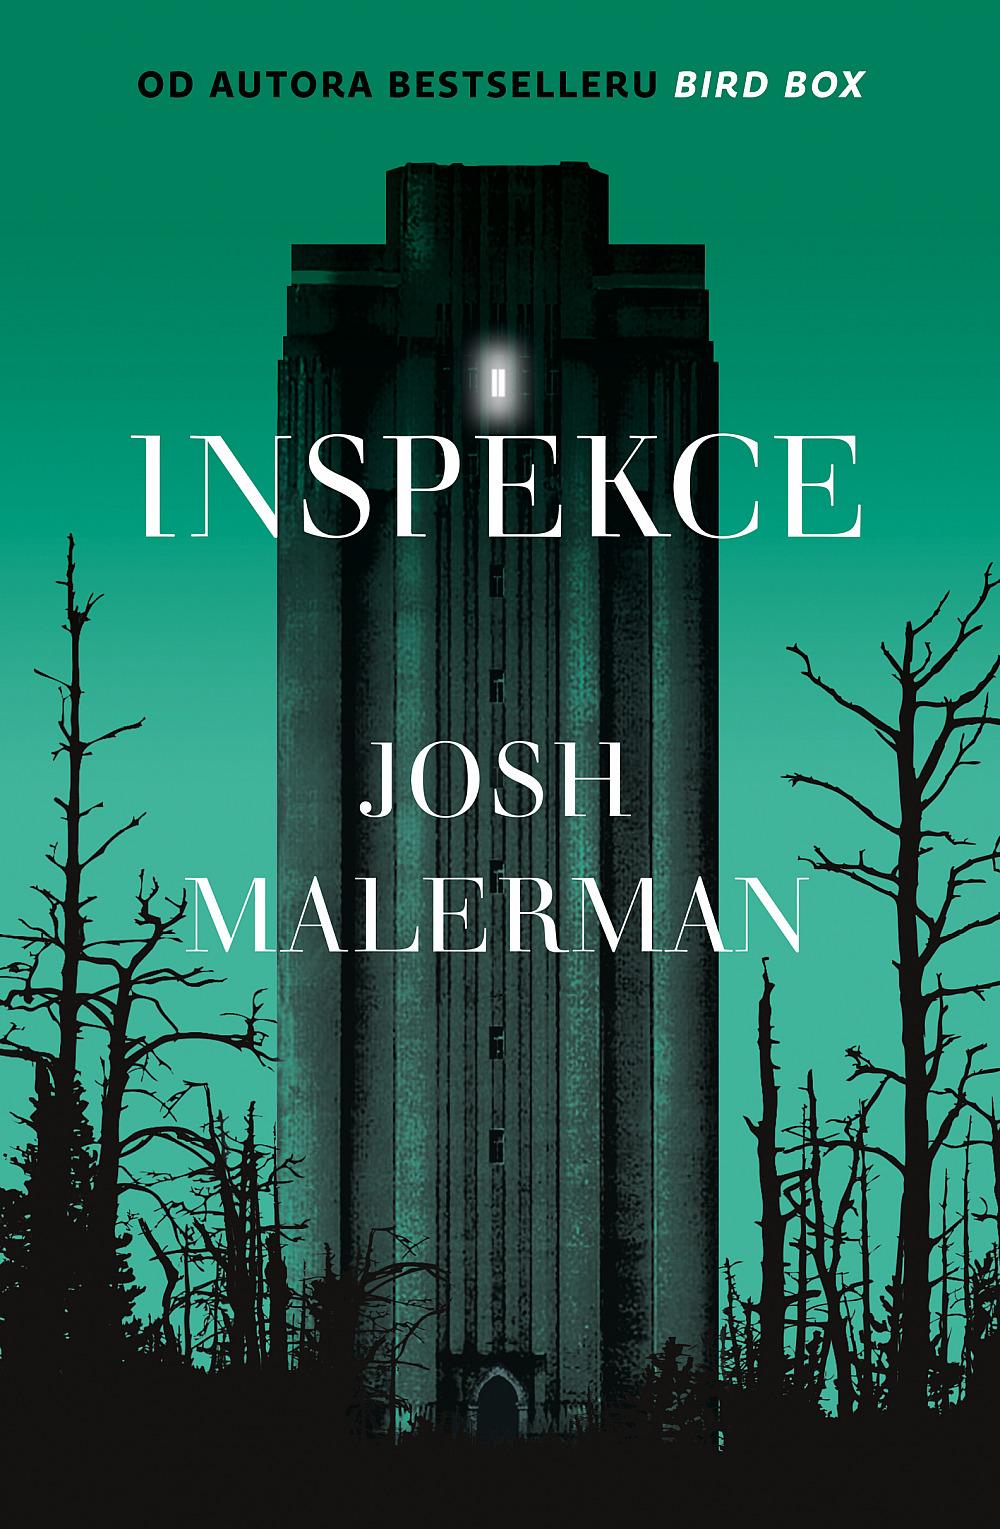 Inspekce - Josh Malerman | Databáze knih